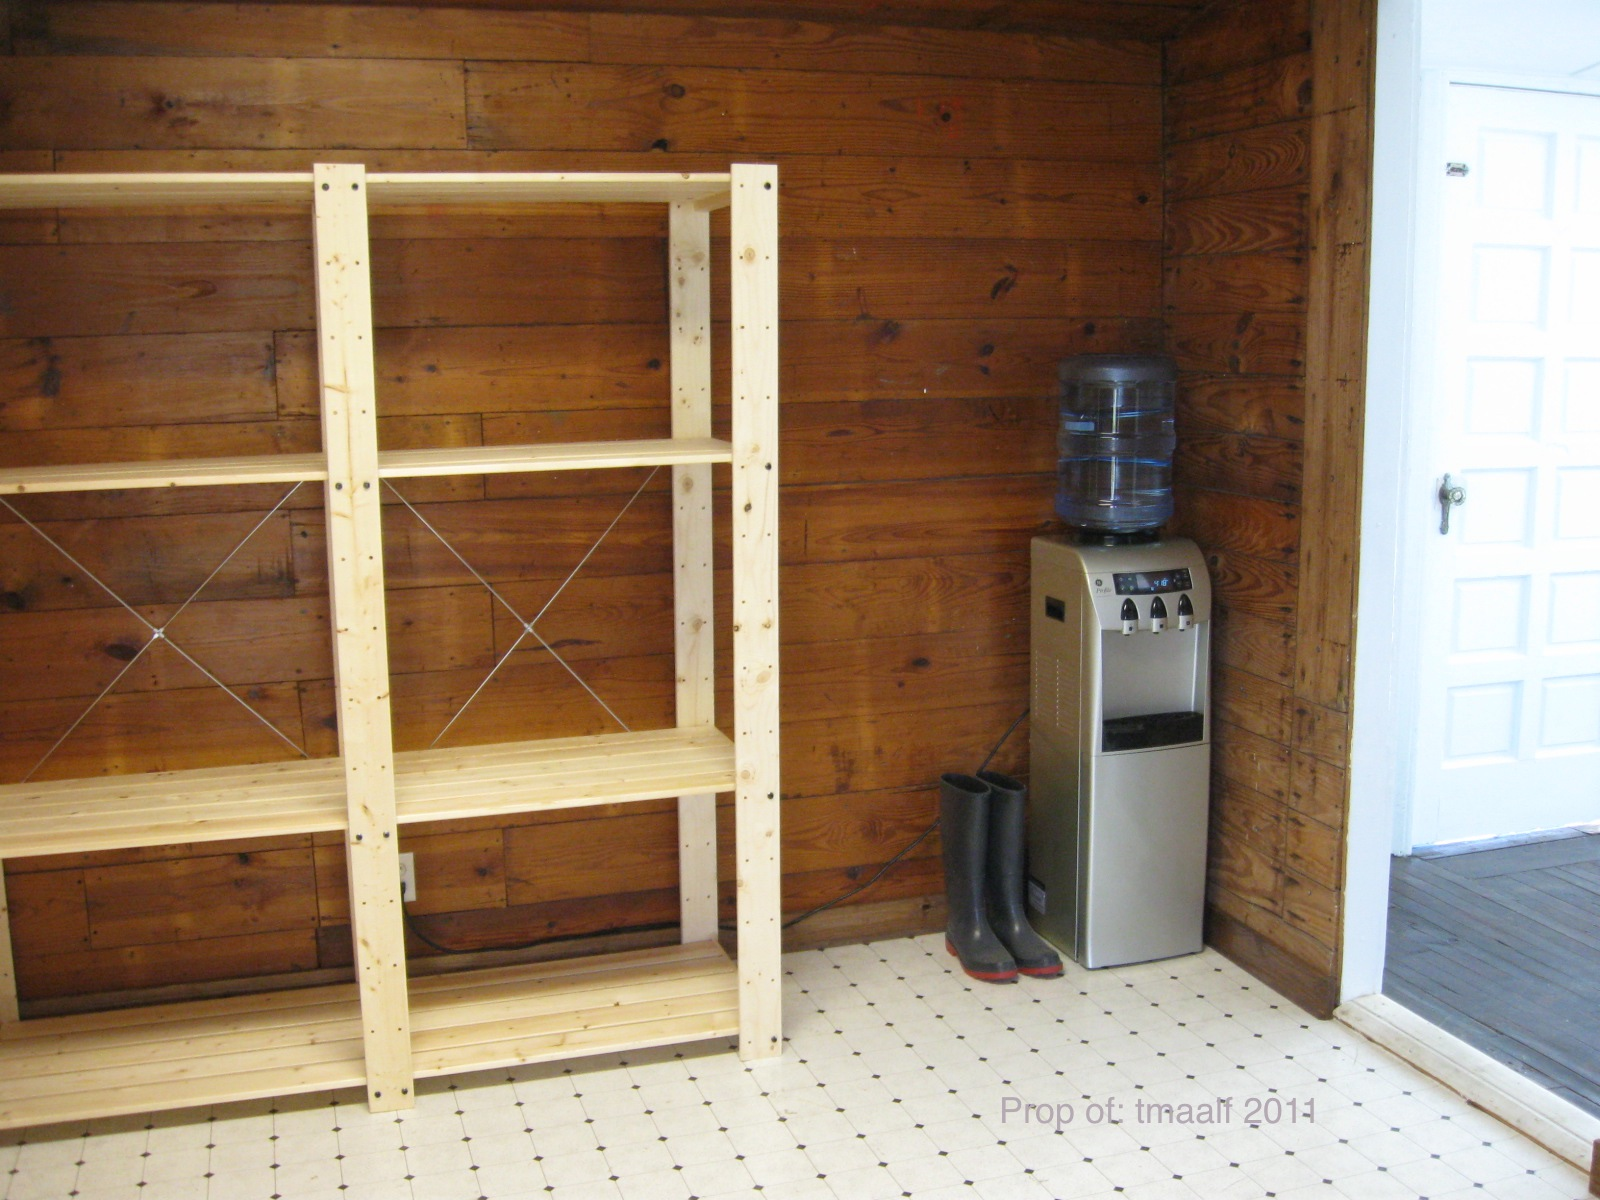 Garage apartment ikea hacks: diy reclaimed wood buffet ikea hack ...